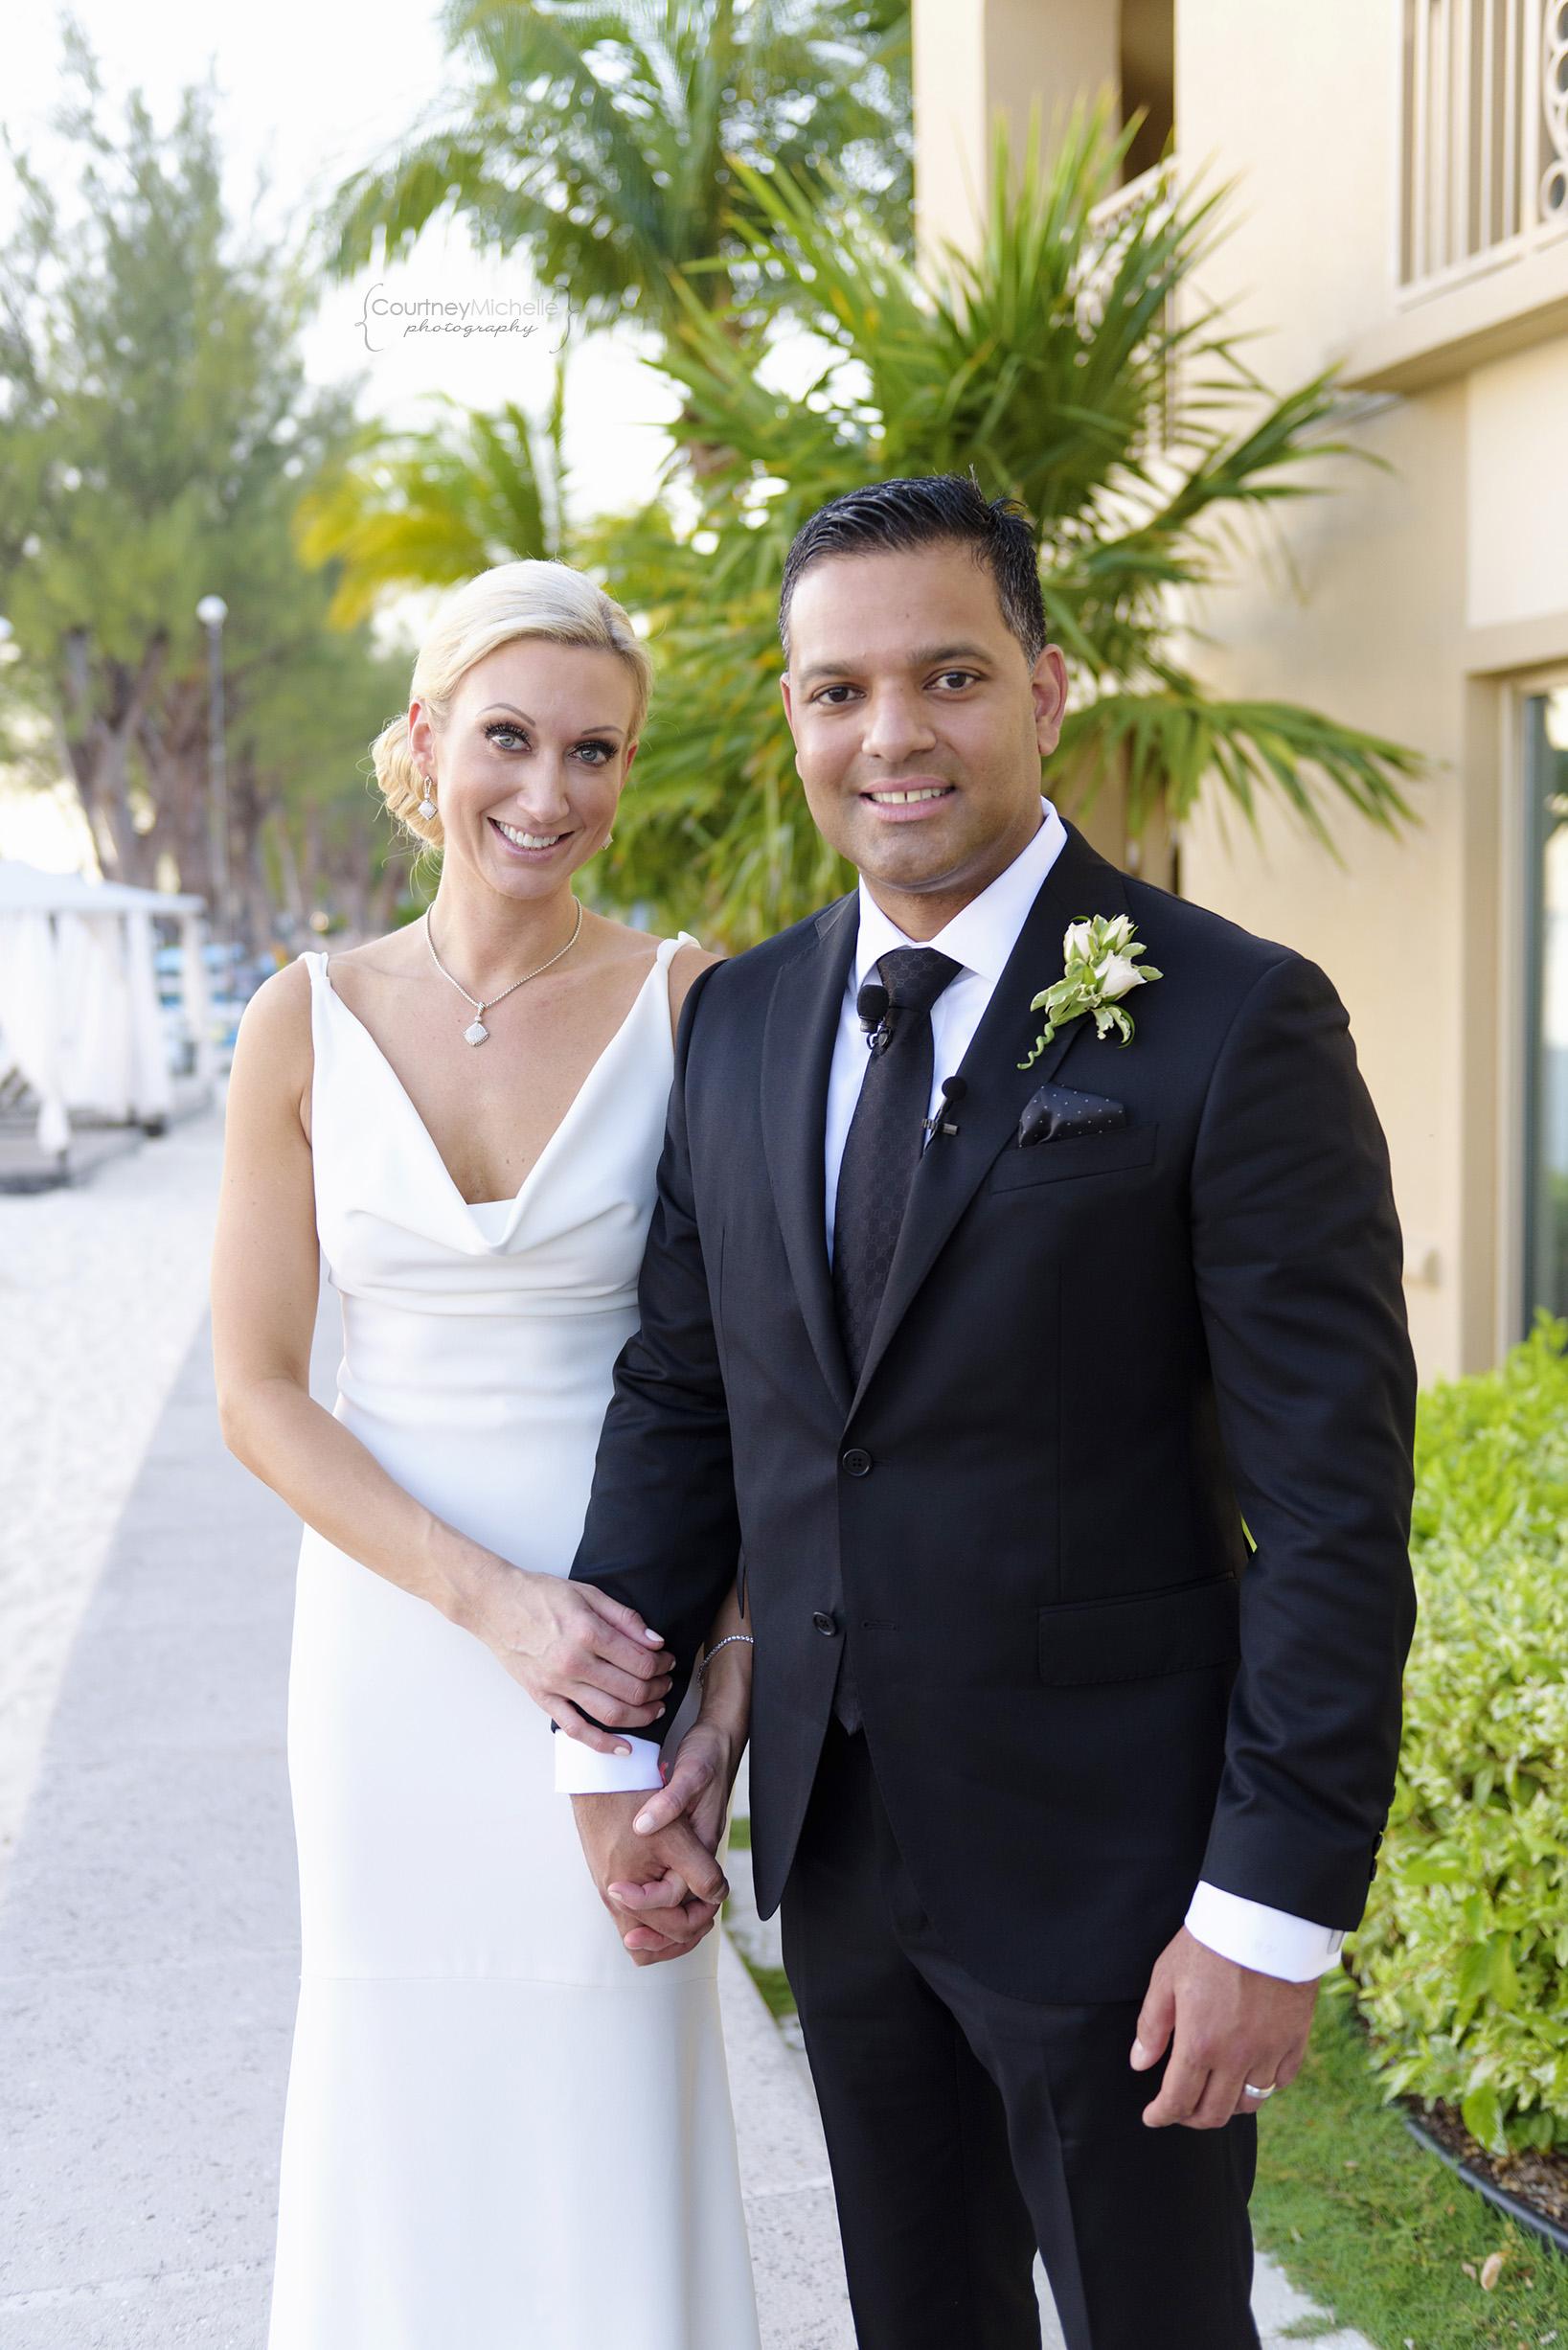 bride-and-groom-portrait-grand-cayman-beach-wedding-photography-by-courtney-laper©CopyrightCMP-LeaAnneRaj-7836.jpg